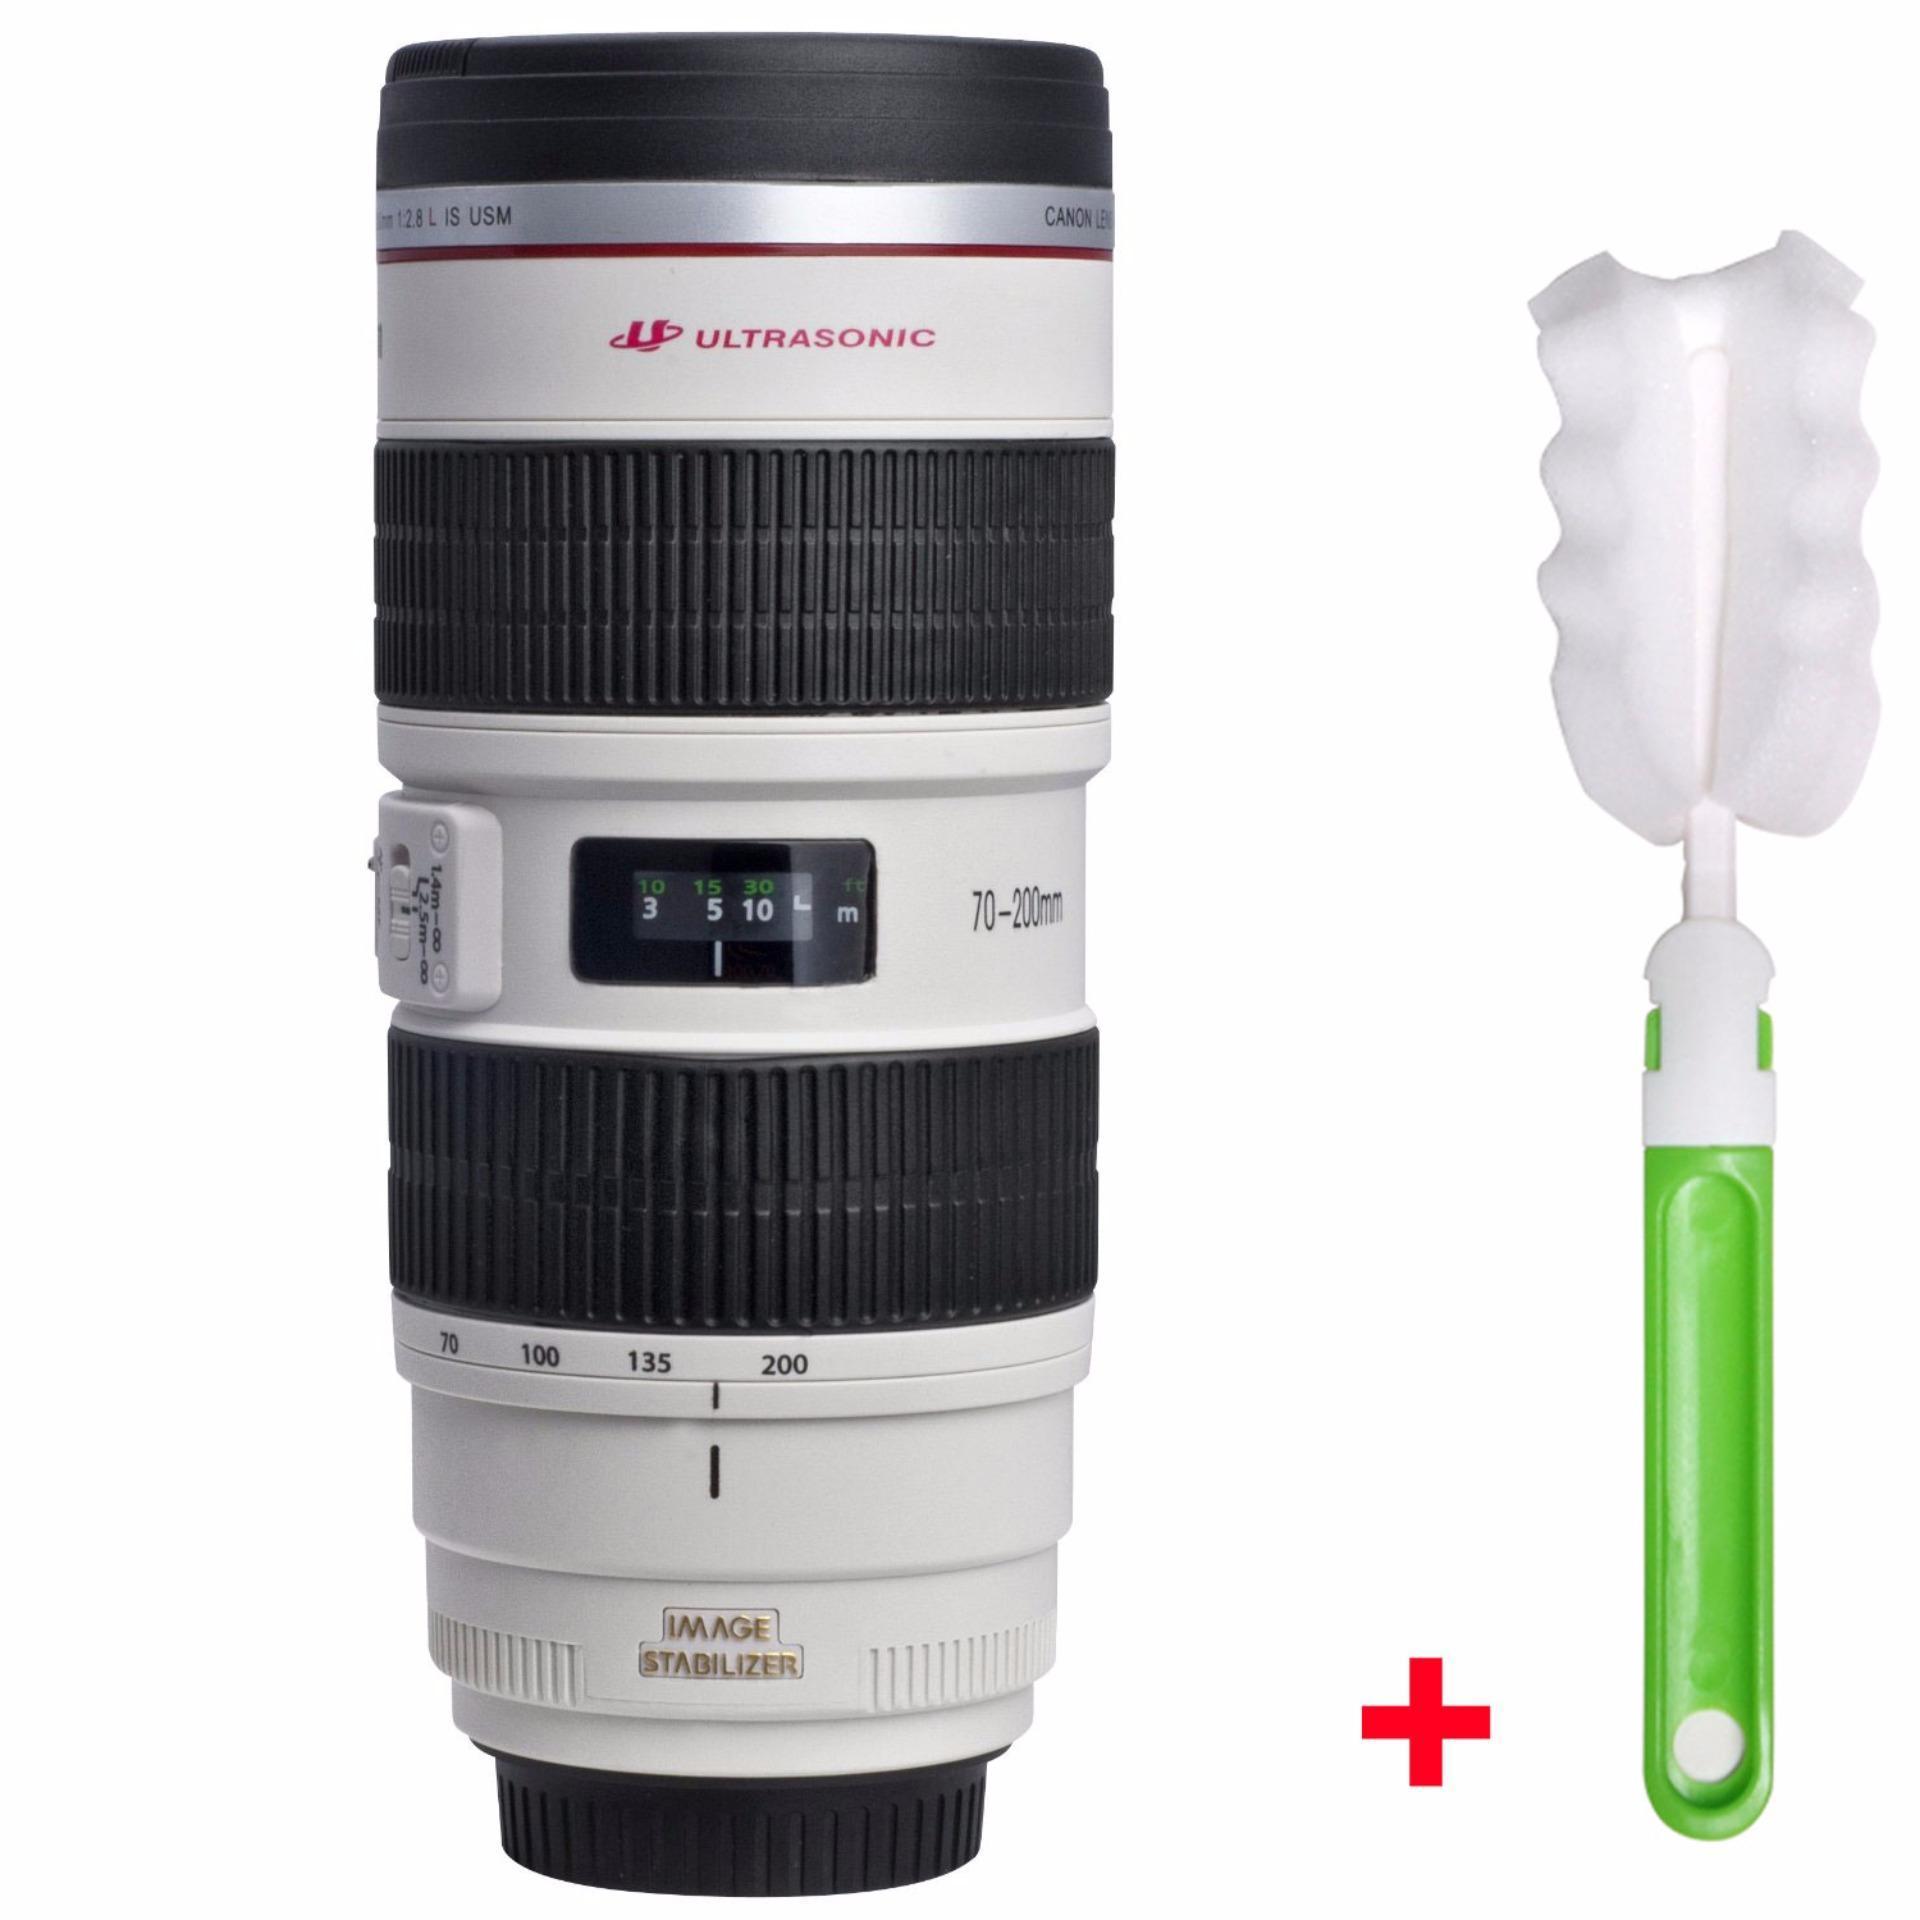 Somine Camera Lens Mug Caniam 70-200mm 1:1 Model Coffee Cup Travel Mug